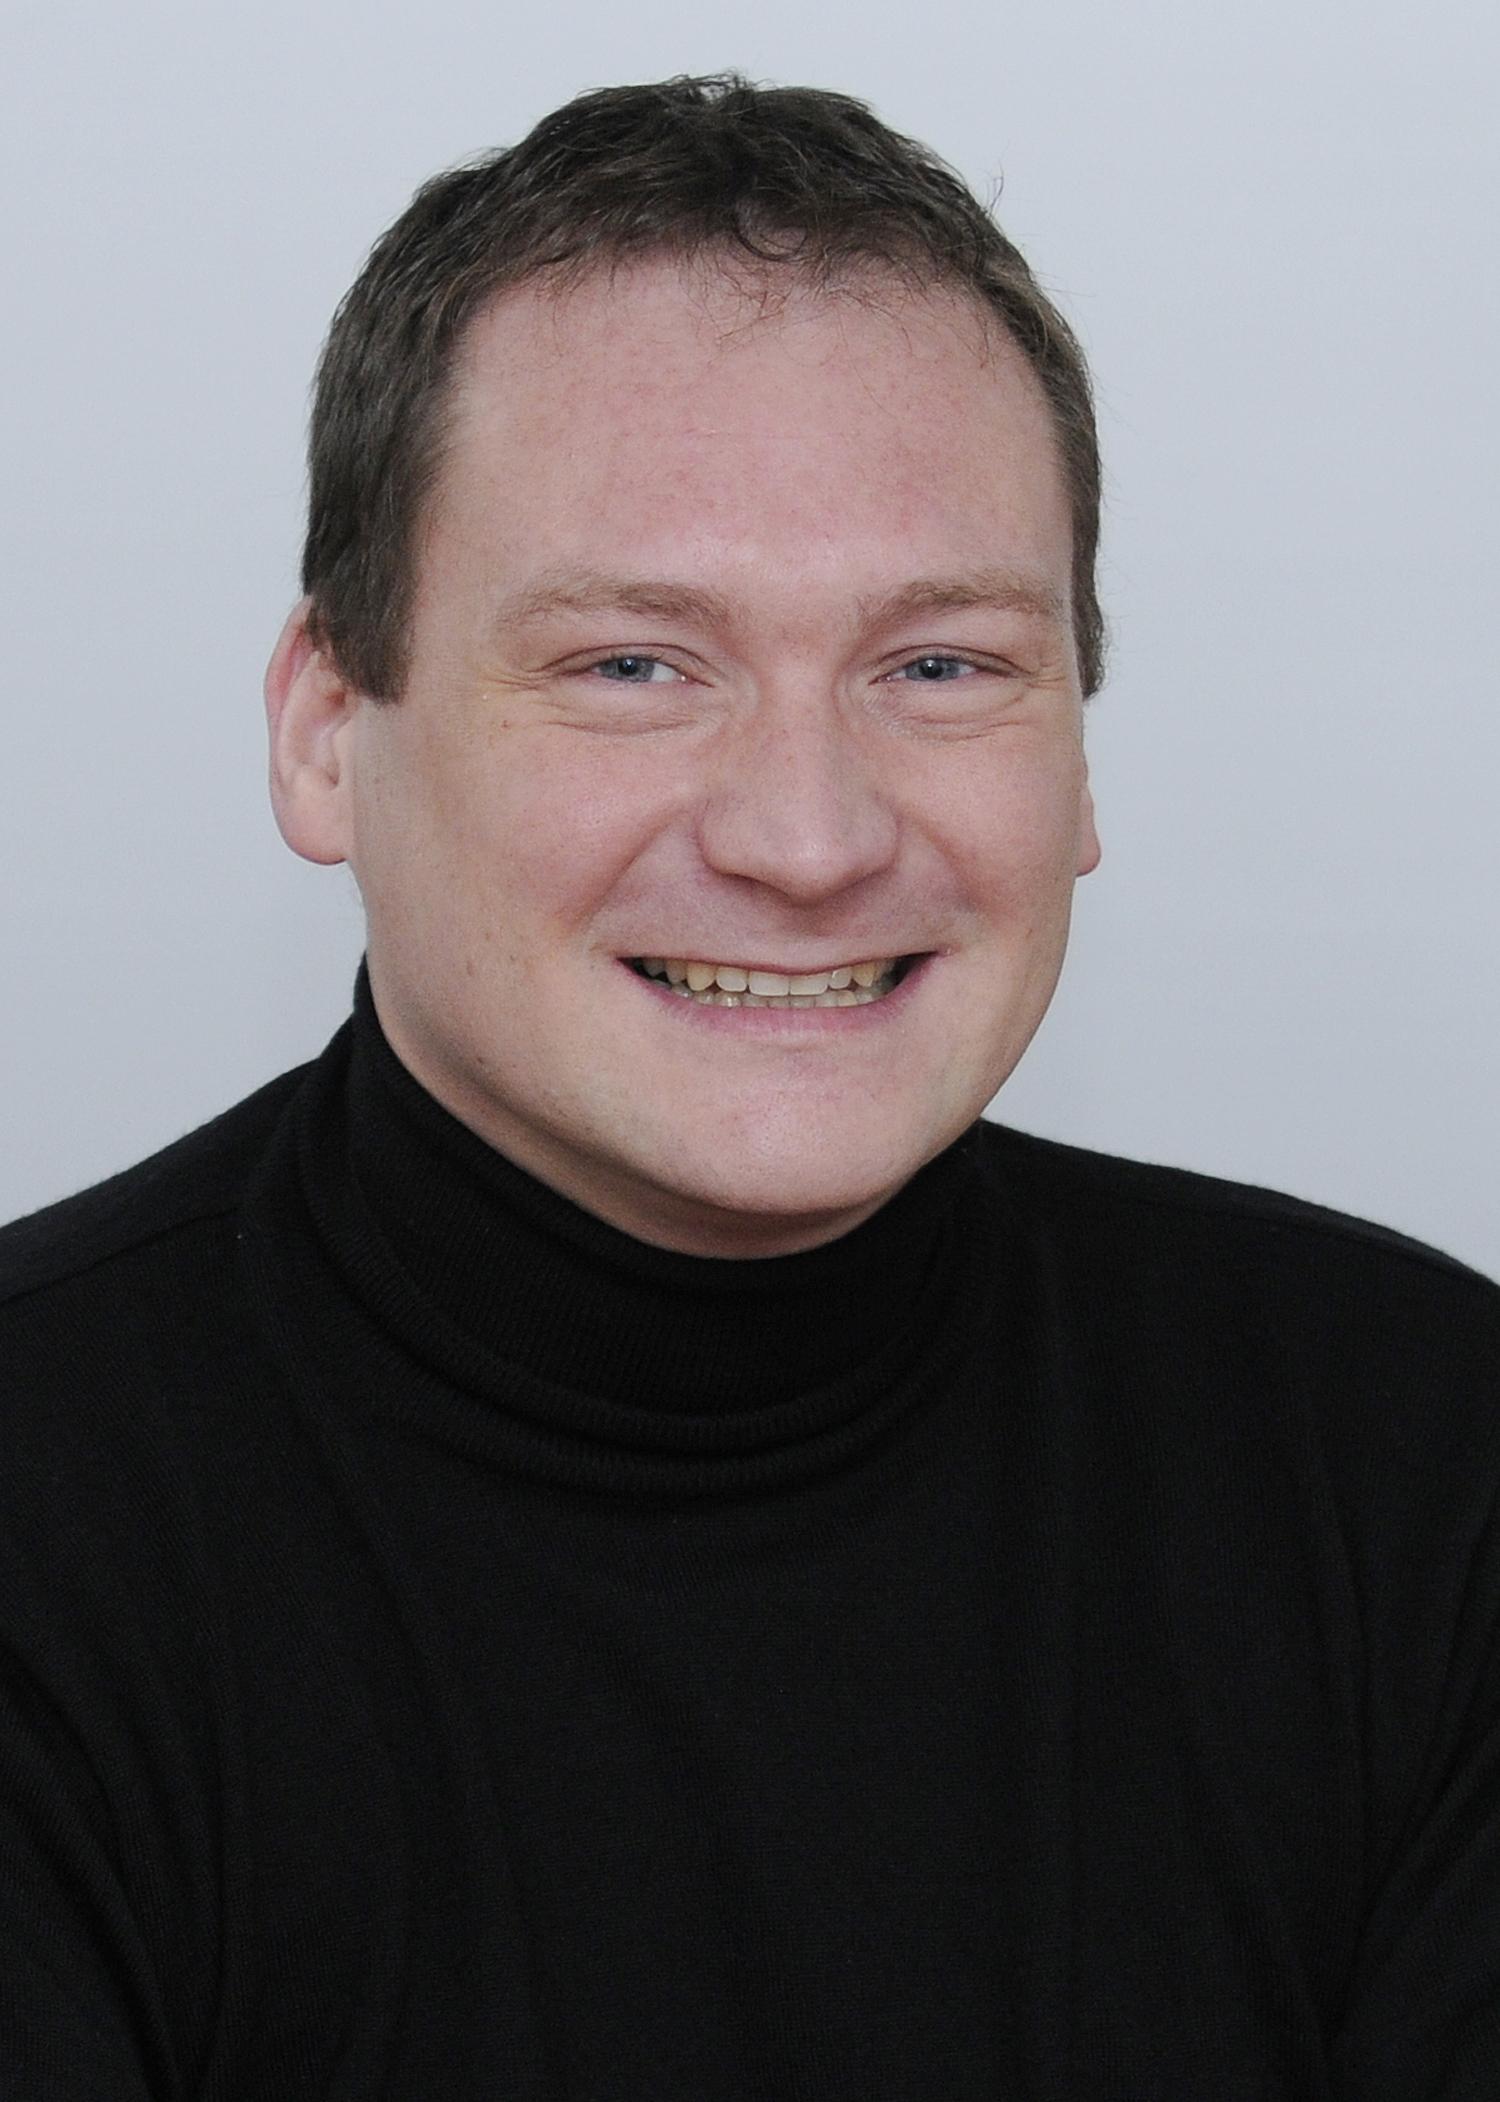 Andreas Menges